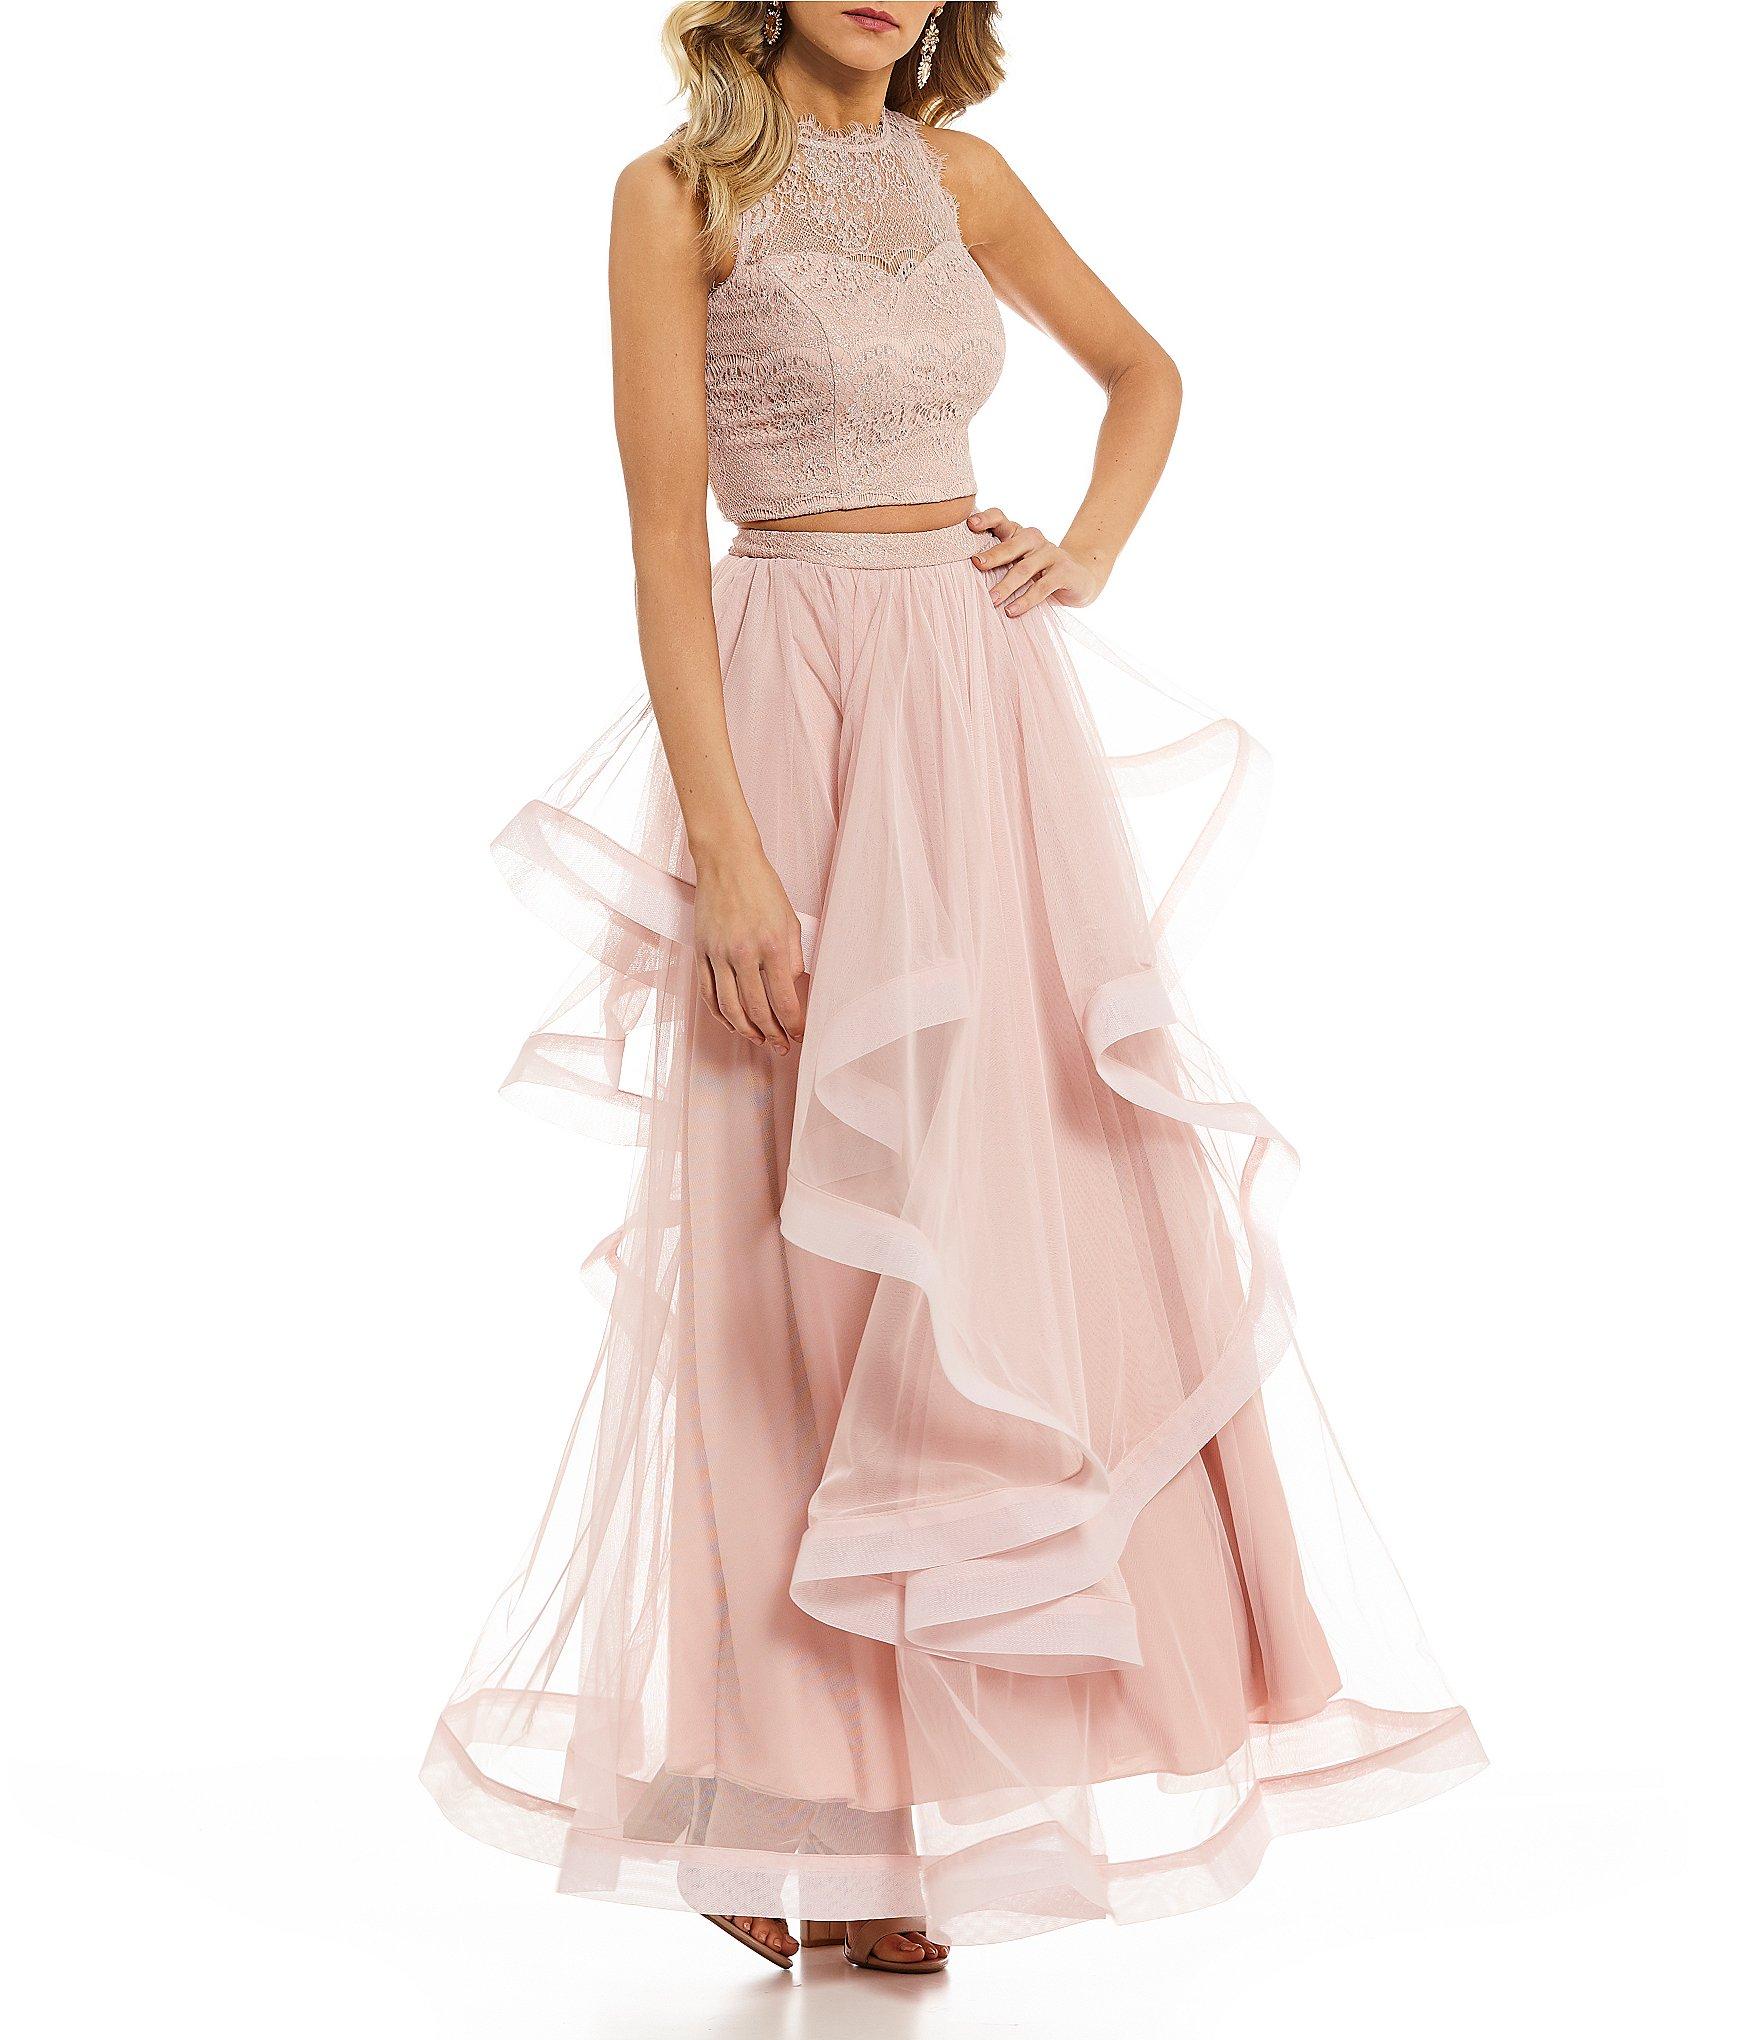 clearance prom dresses: Juniors\' Clothing | Dillards.com